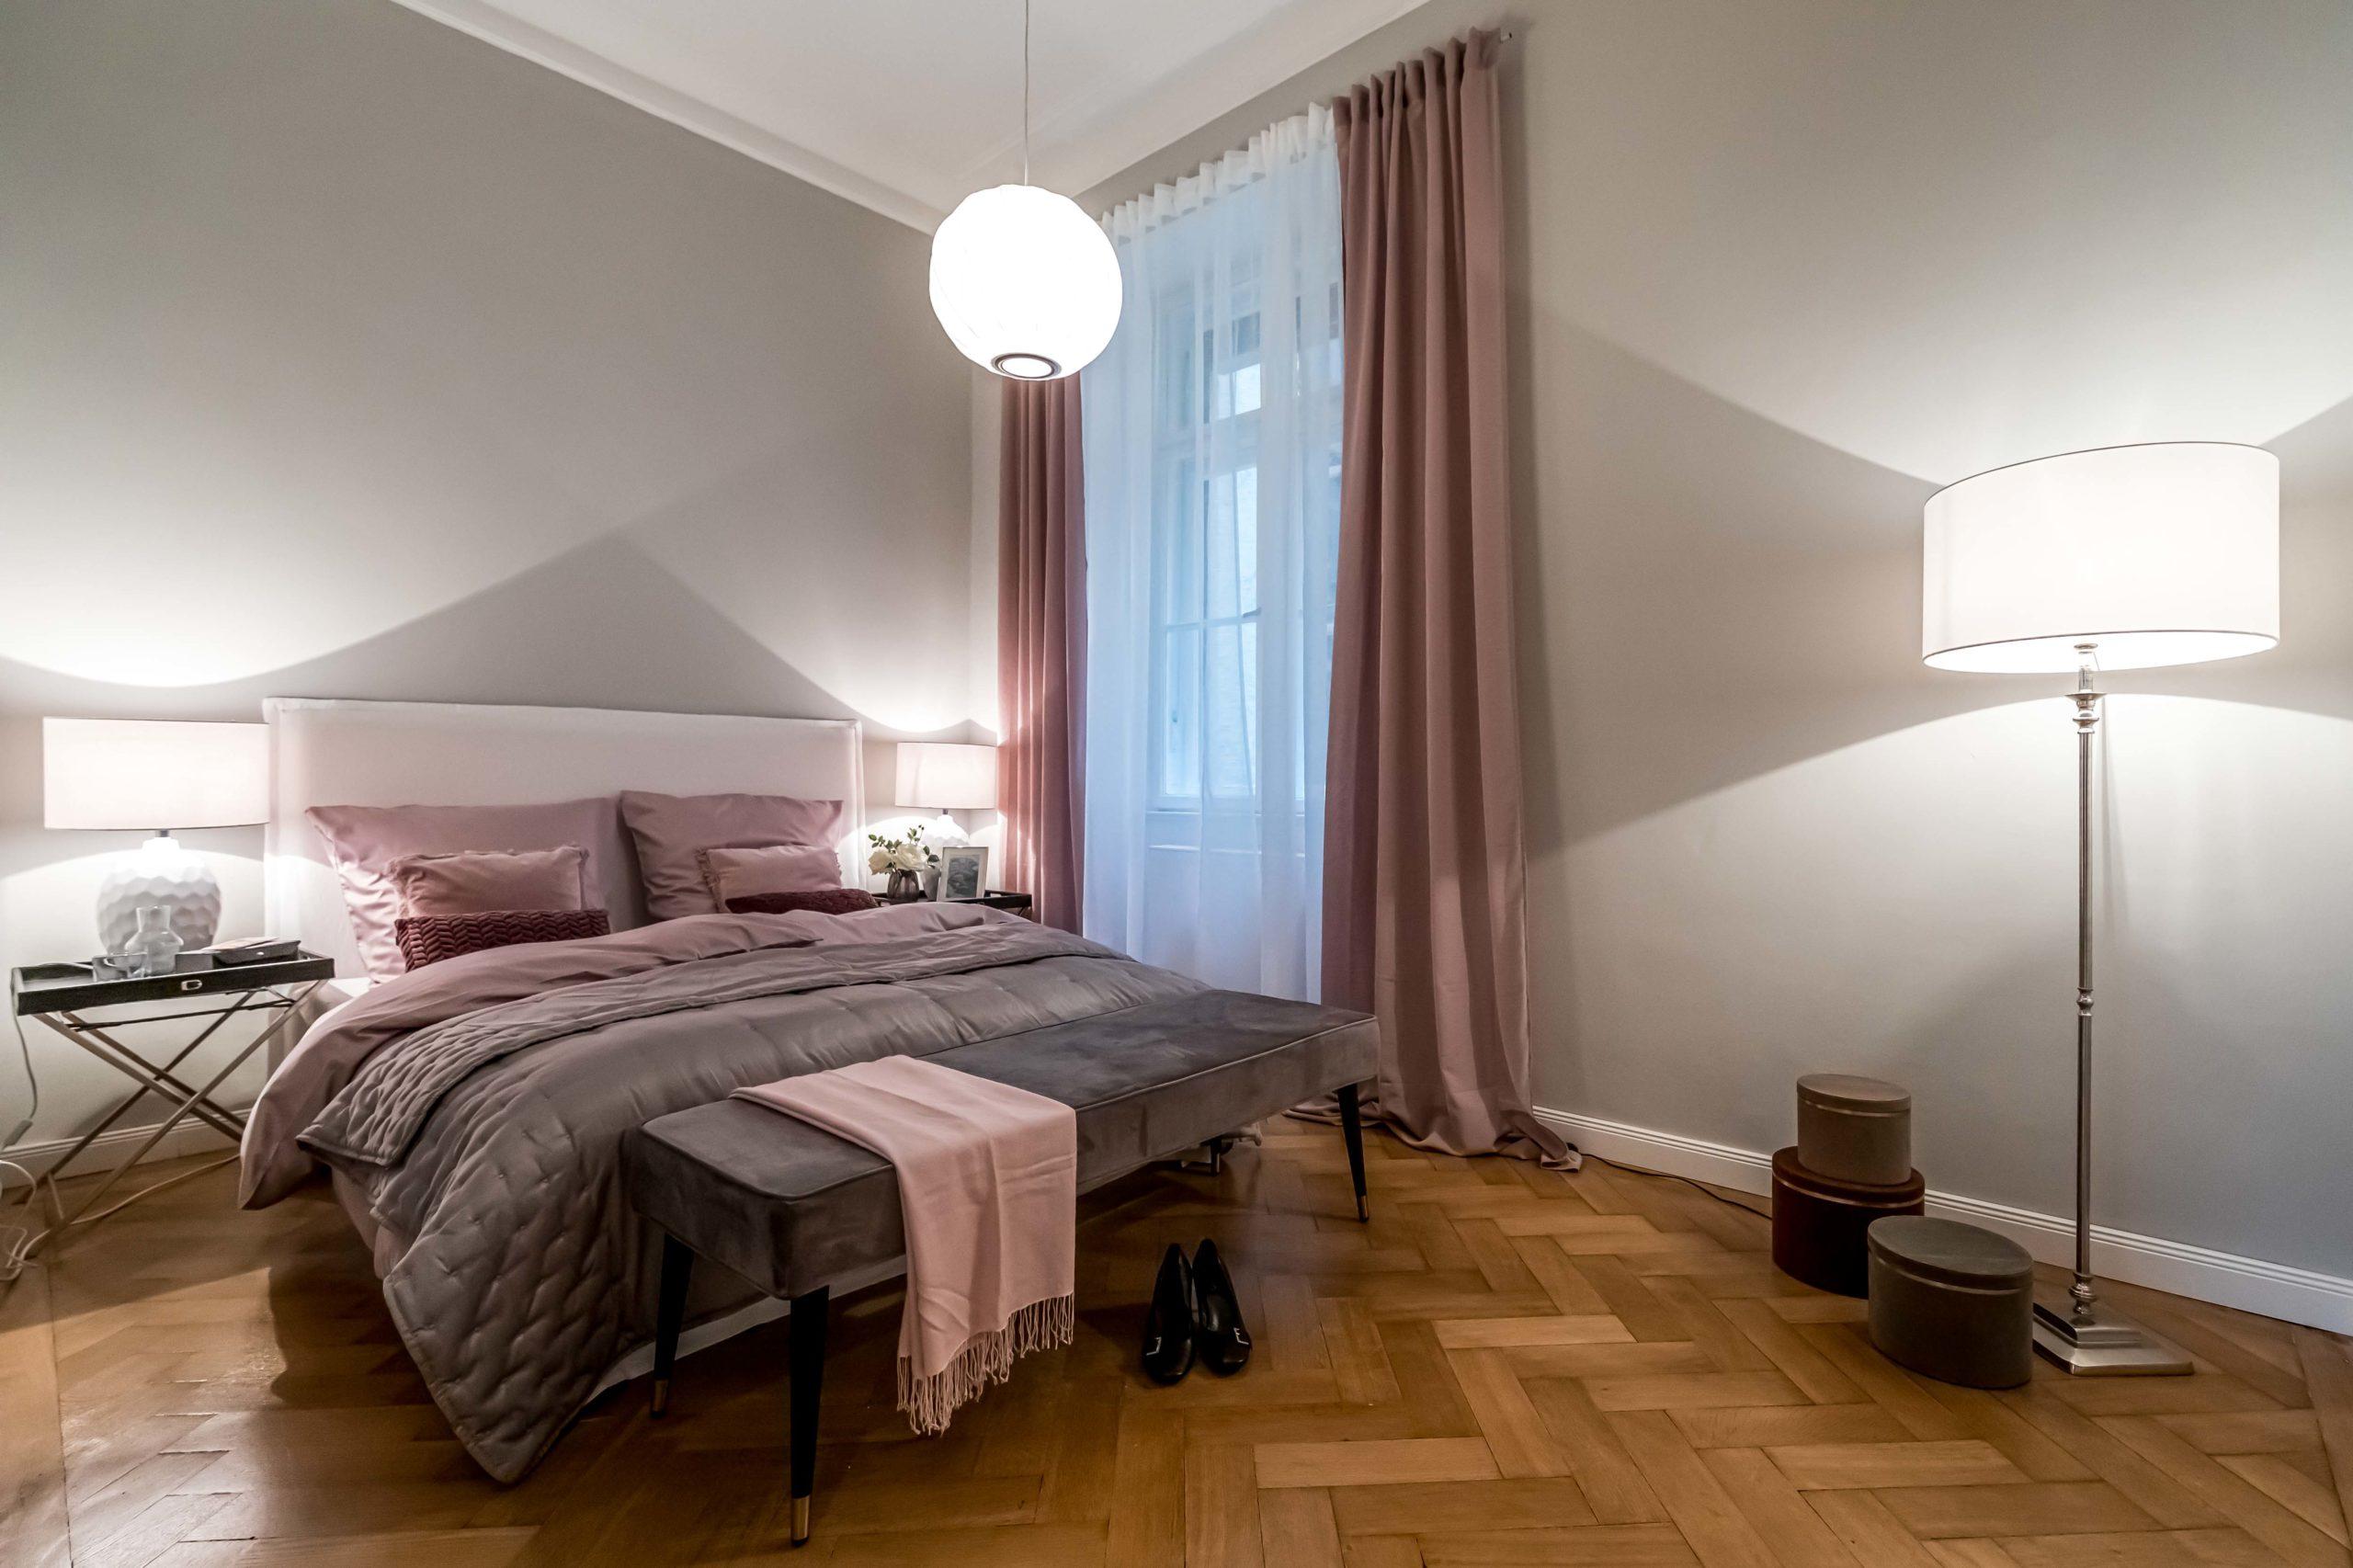 Immobilienfotografie München-anja-richter-fotografie ETW Widenmayerstr. 8 EG-5